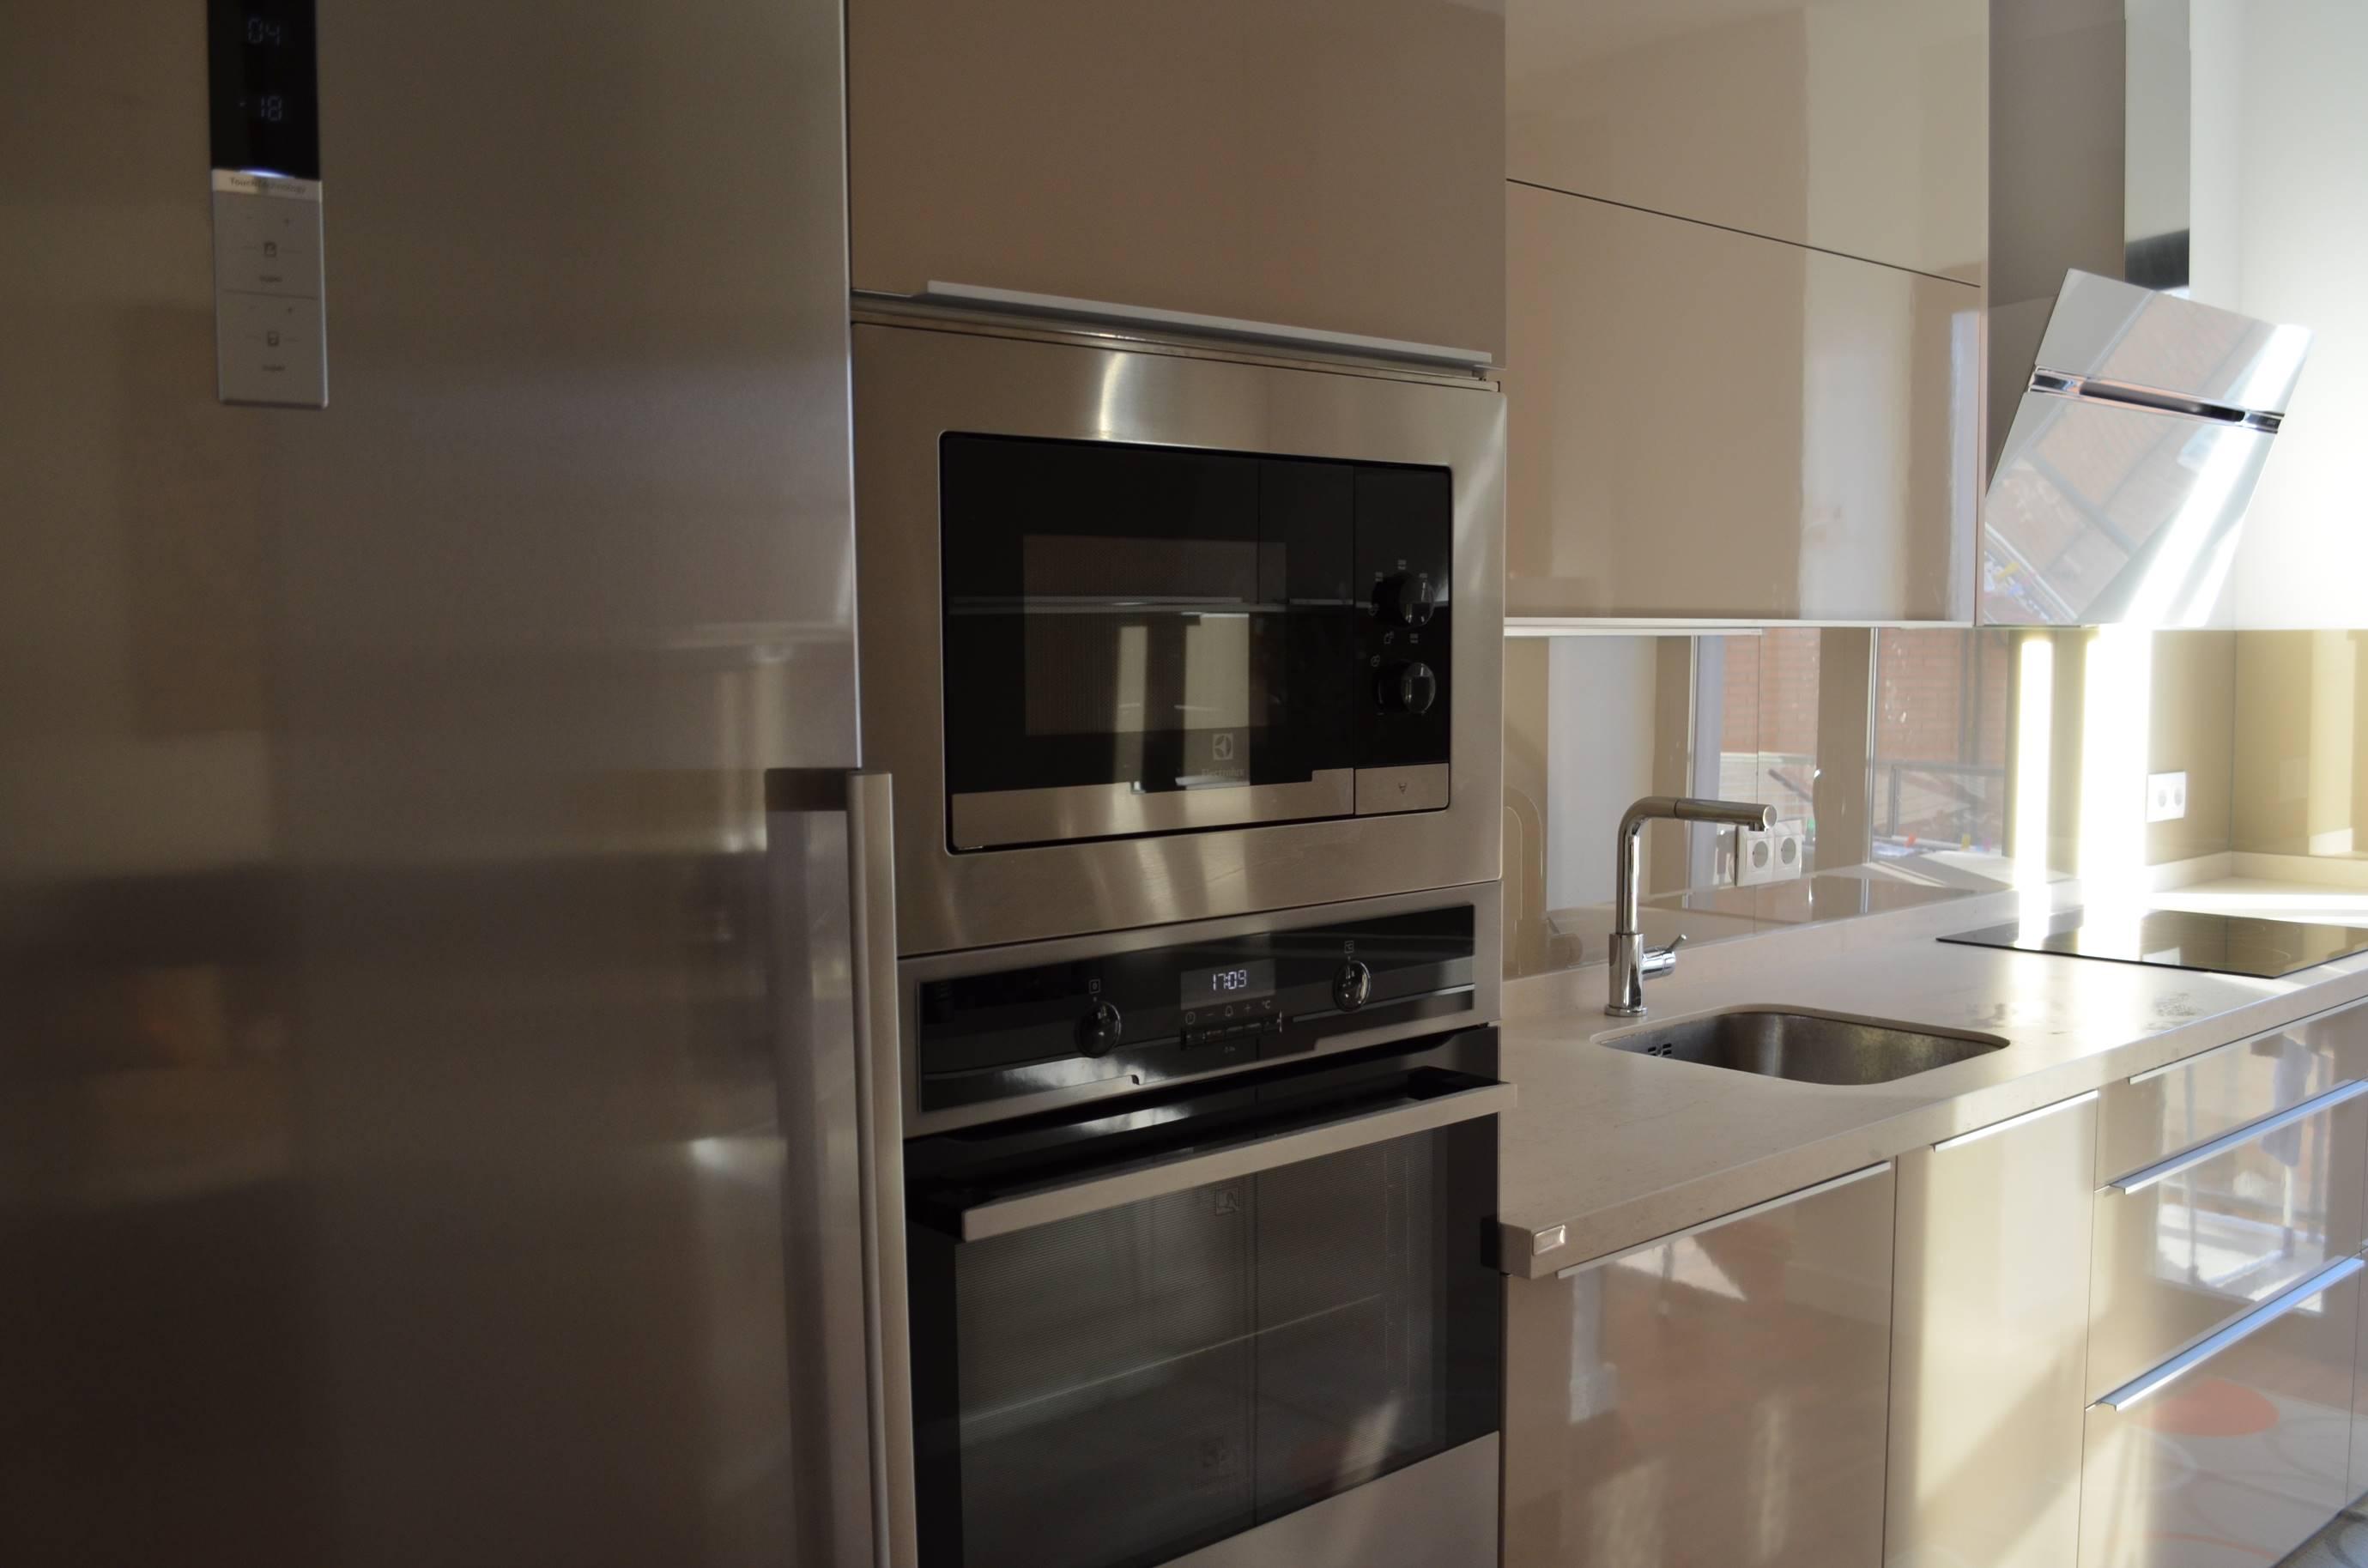 Muebles De Cocina Xey - Arquitectura Del Hogar - Serart.net